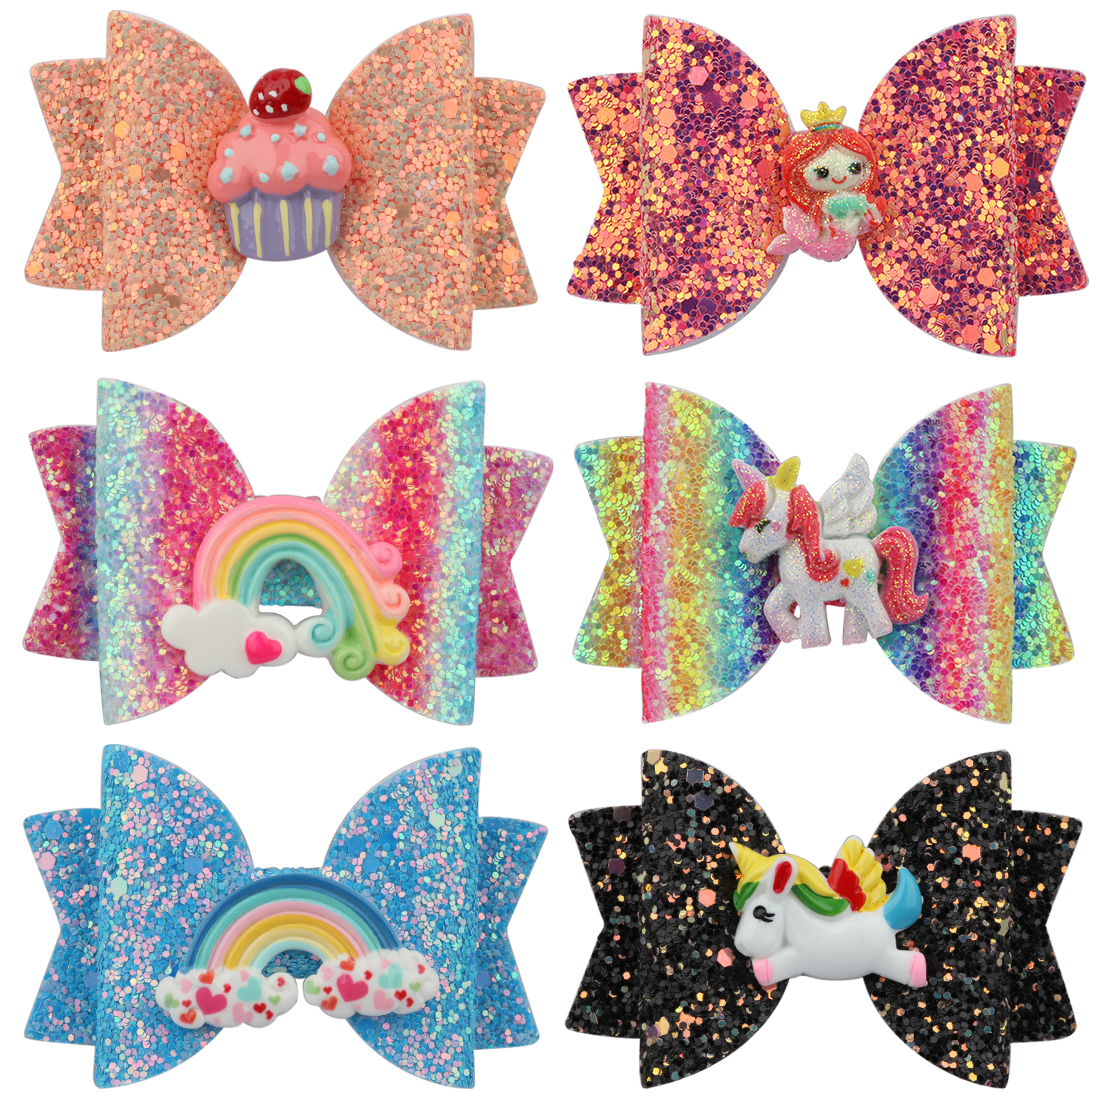 1 PC Girls Barrettes Unicorn Hairpins Glitter Hair Bow Clips 3 Inch Rainbow Hairbow Kids Shiny Hairgrips Children Sweet Headwear